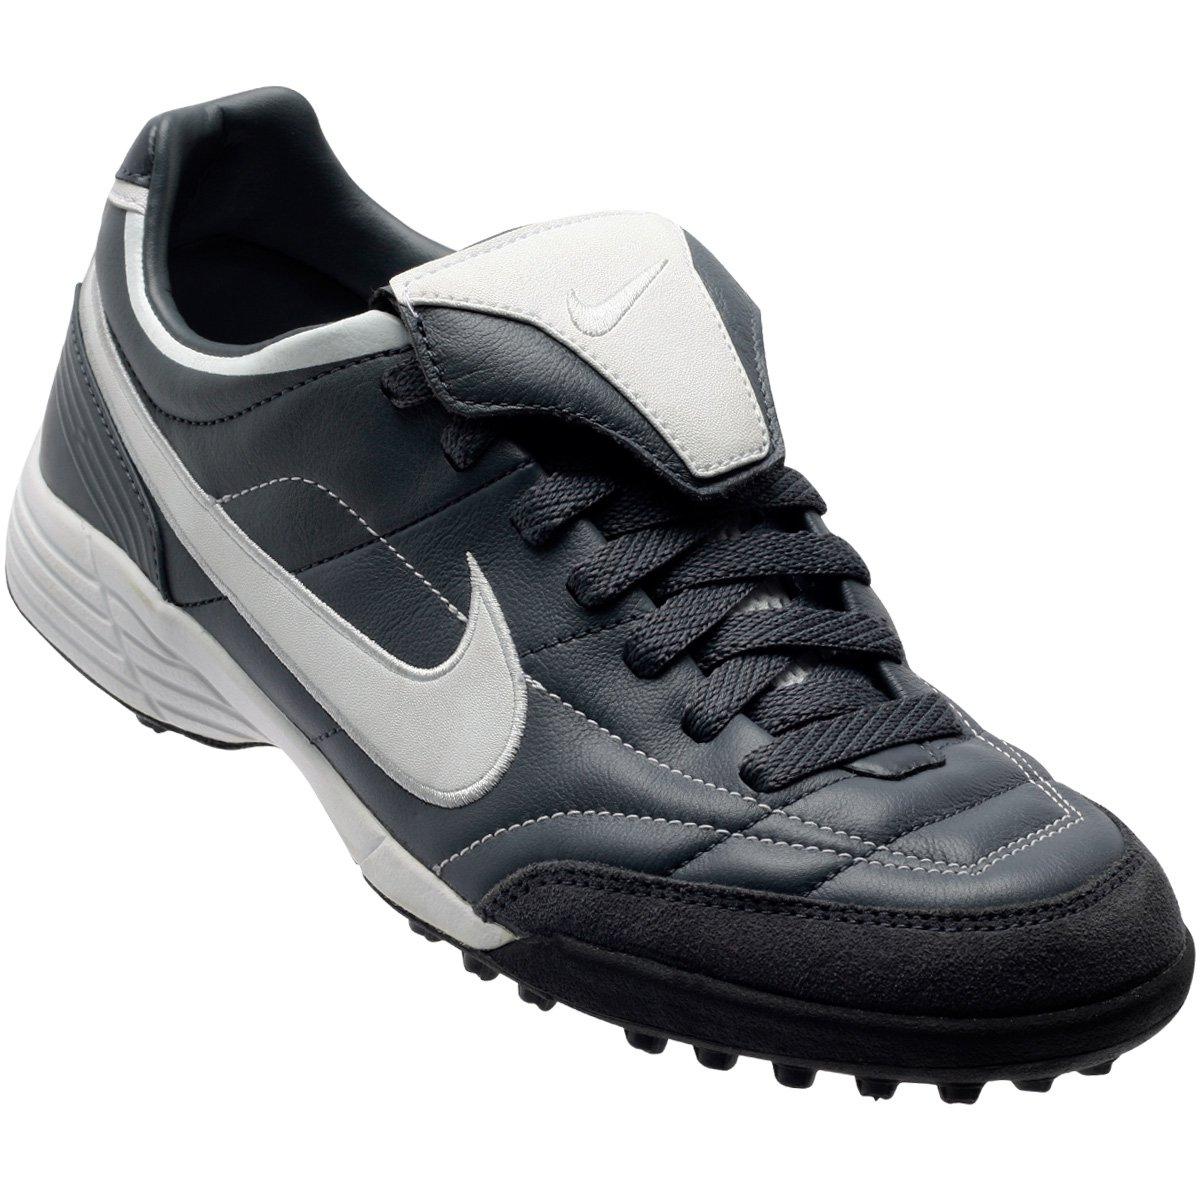 Chuteira Nike Air Tiempo Mystic TF Society - Compre Agora  d0a2c4ceedd10